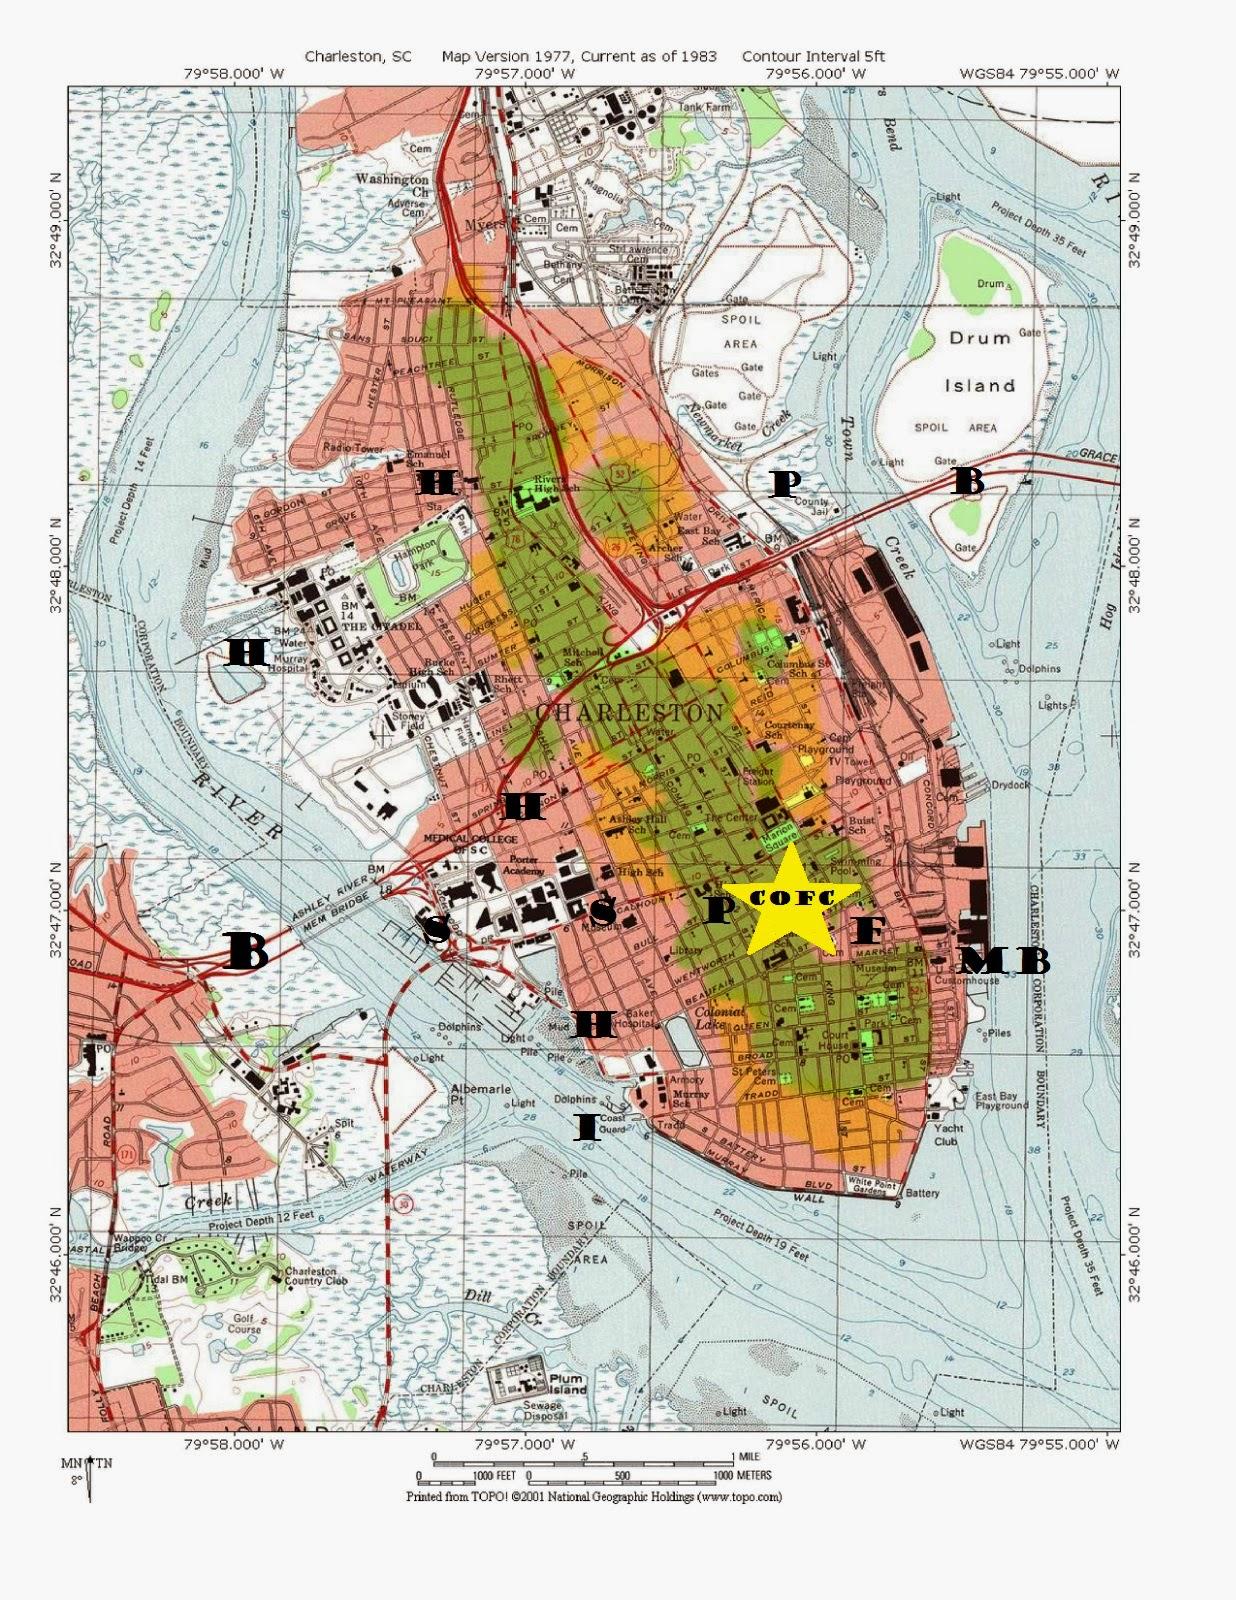 topographic hazard map of charleston with shaded danger zones